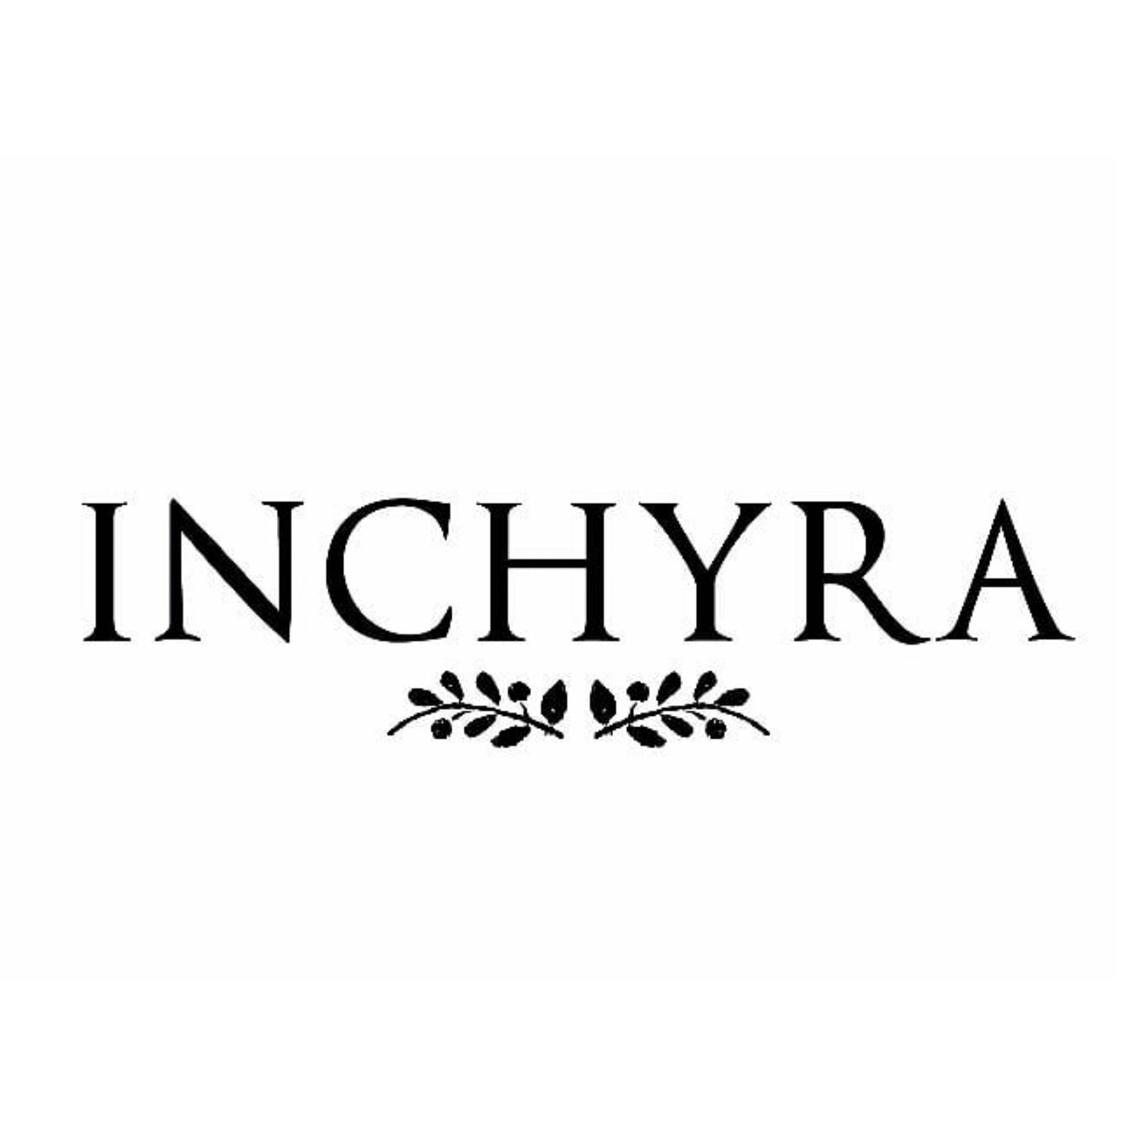 Inchyra